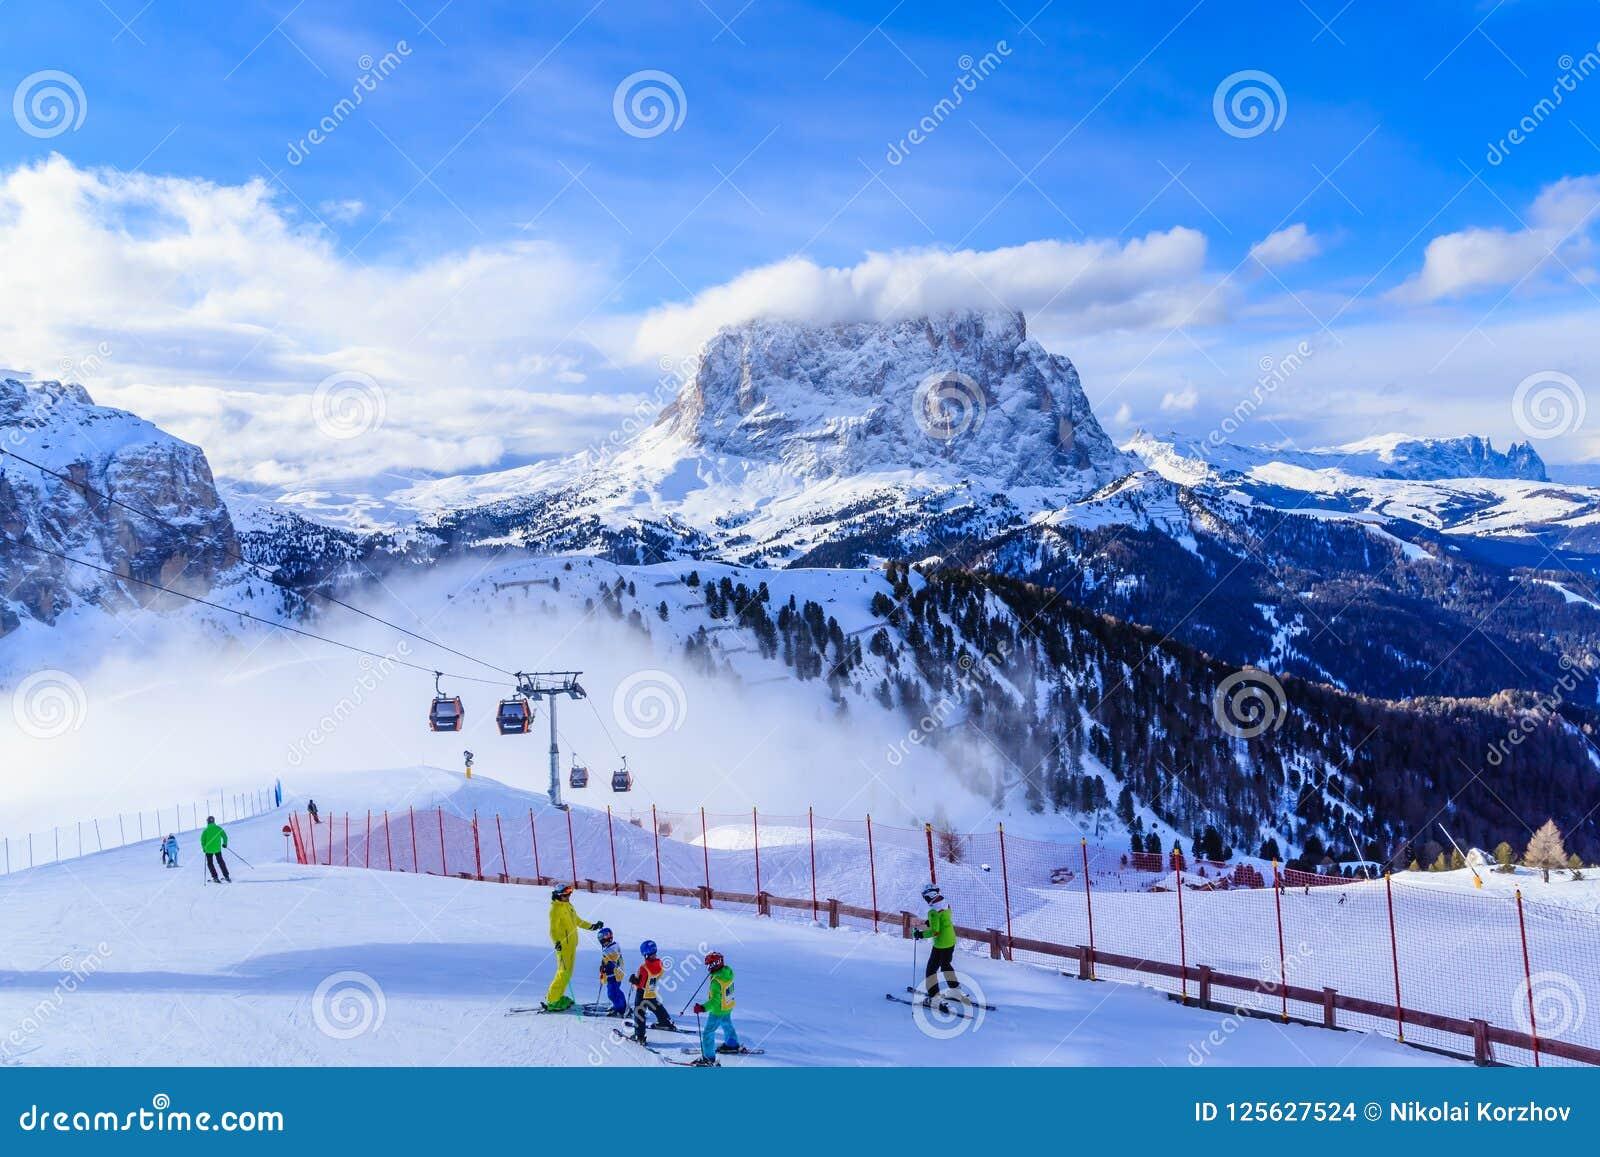 ski resort of selva di val gardena editorial stock image - image of